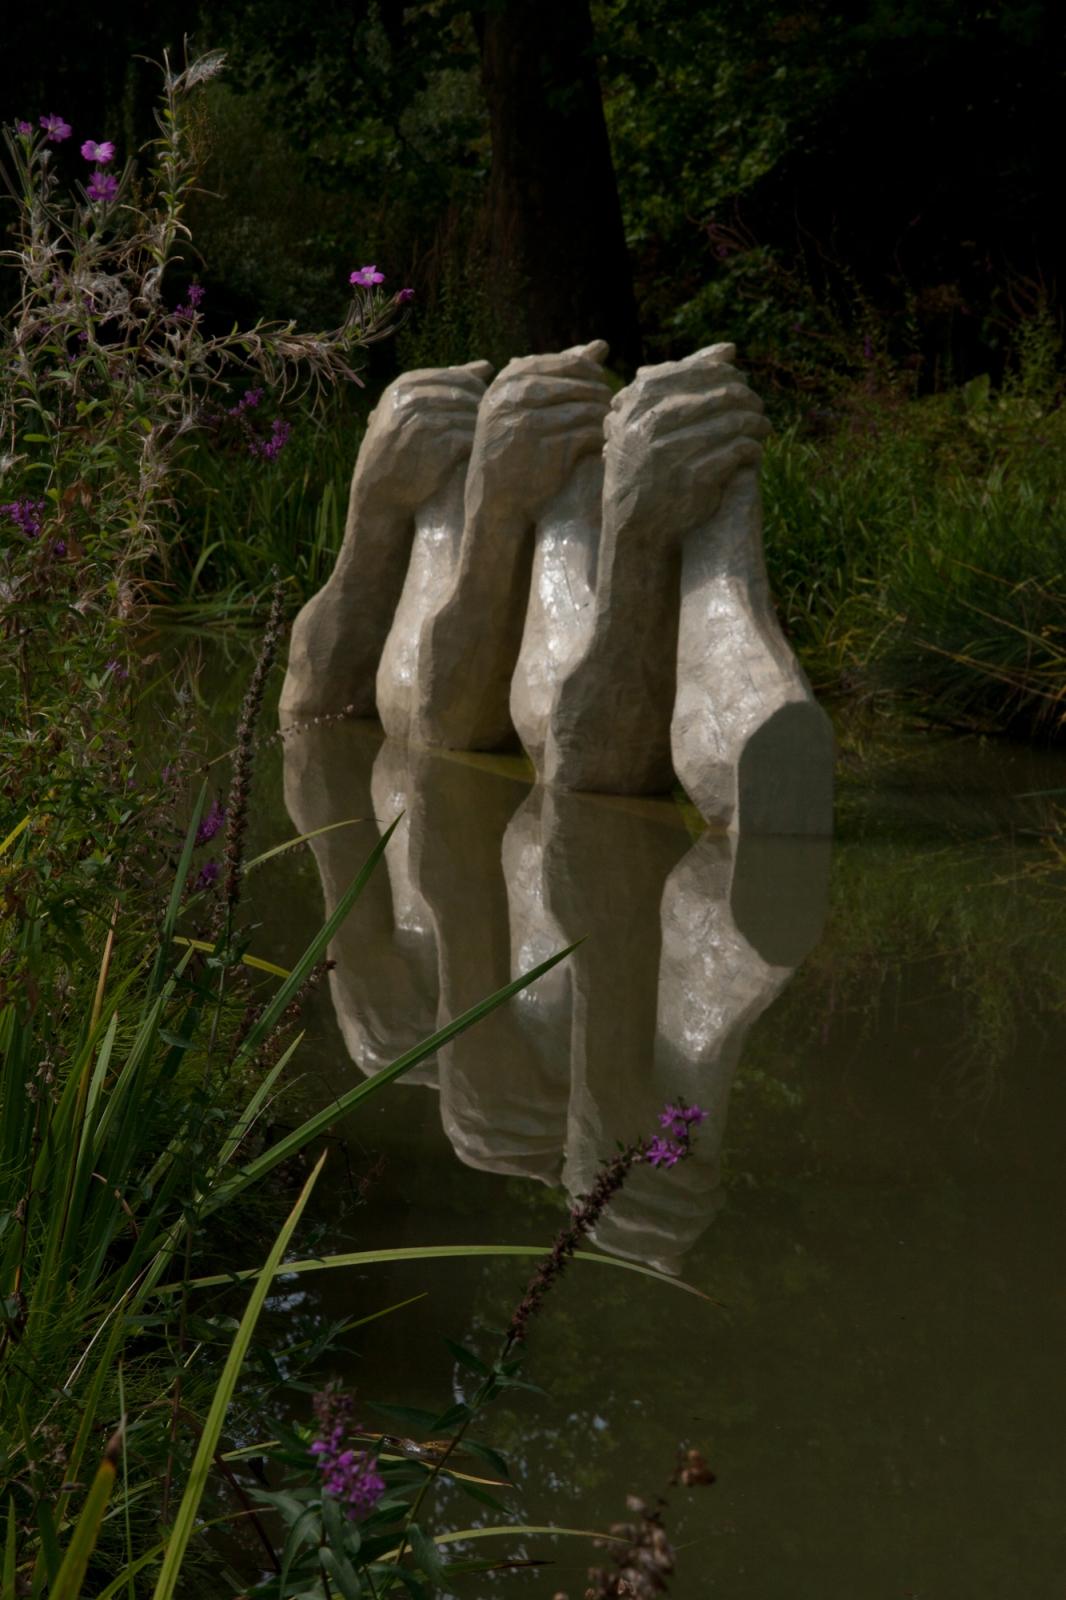 Fight Club, Resin, Styrofoam, Steel, 150 cm x 180 cm x 60 cm x 3 elements, Biennale de Yerres, 2011